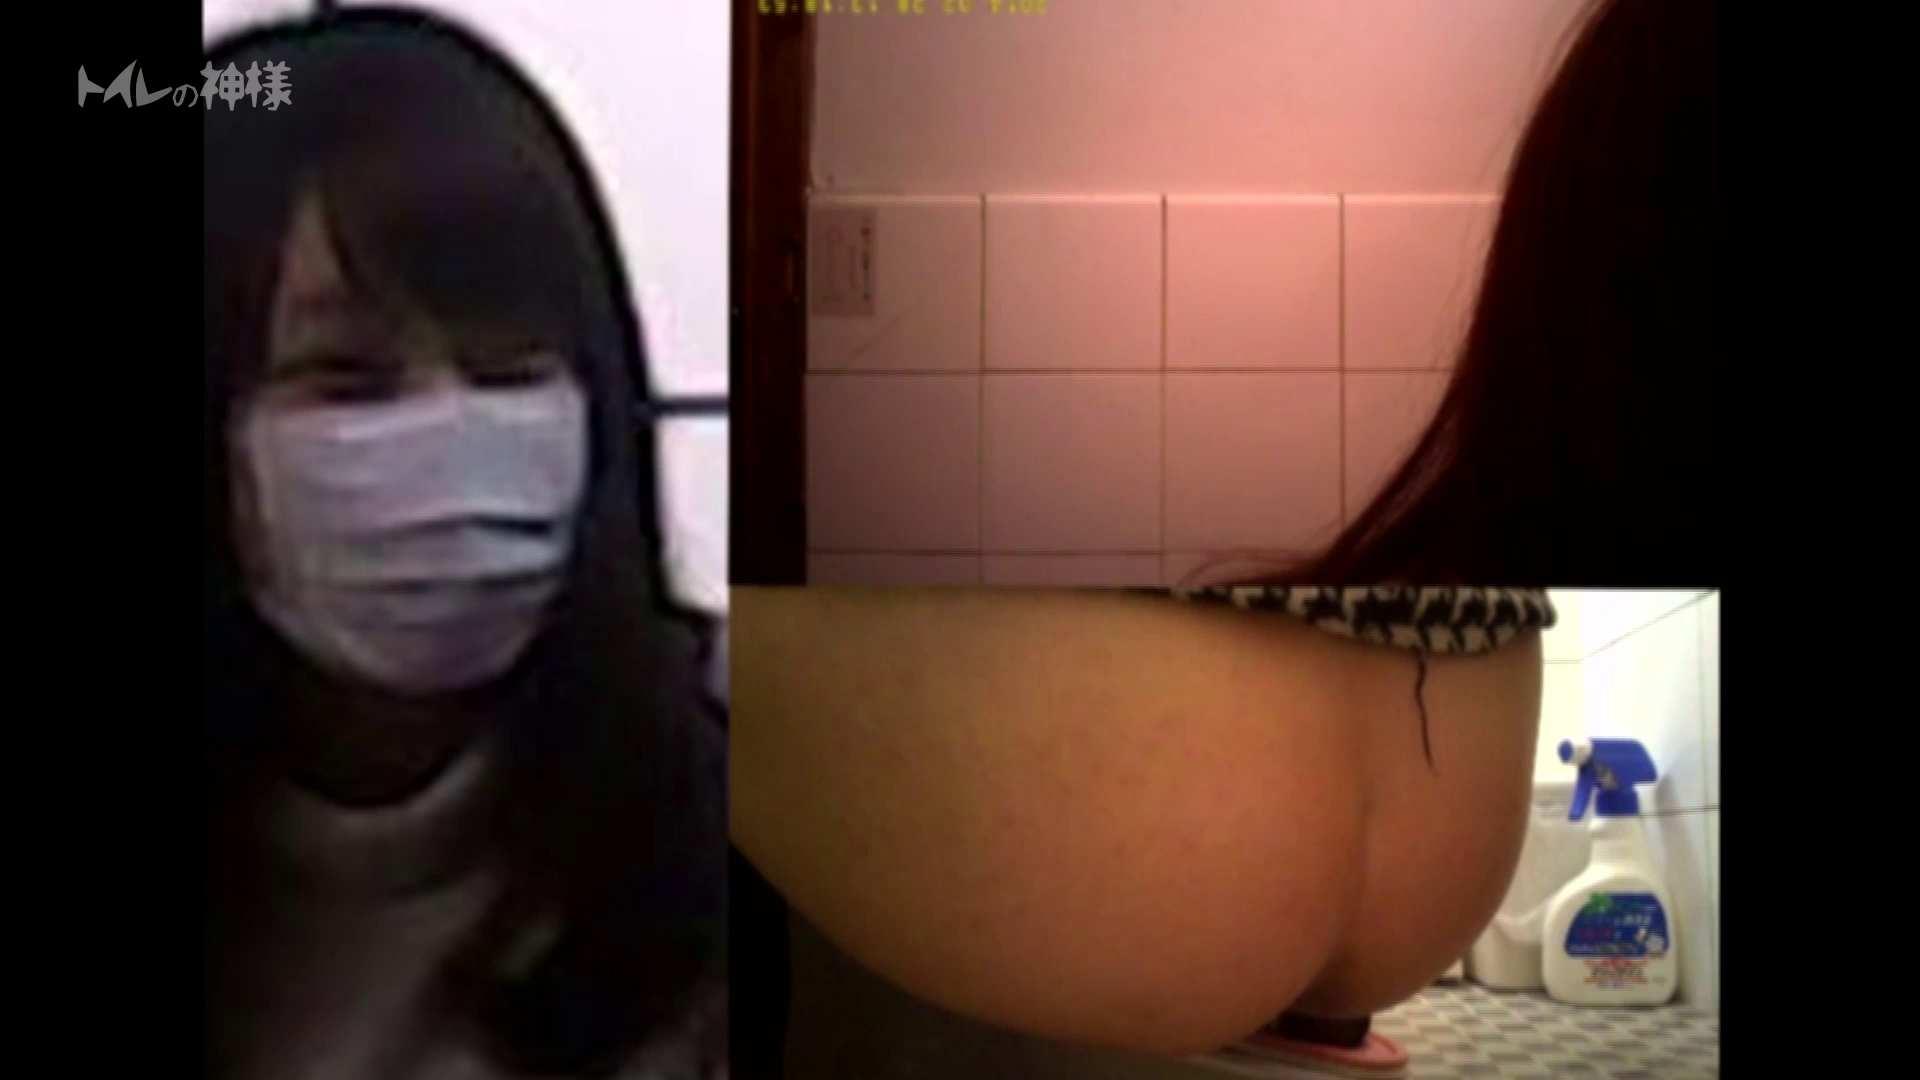 Vol.02 花の女子大生うんこ盗撮2 トイレの実態 盗撮動画紹介 108PIX 33